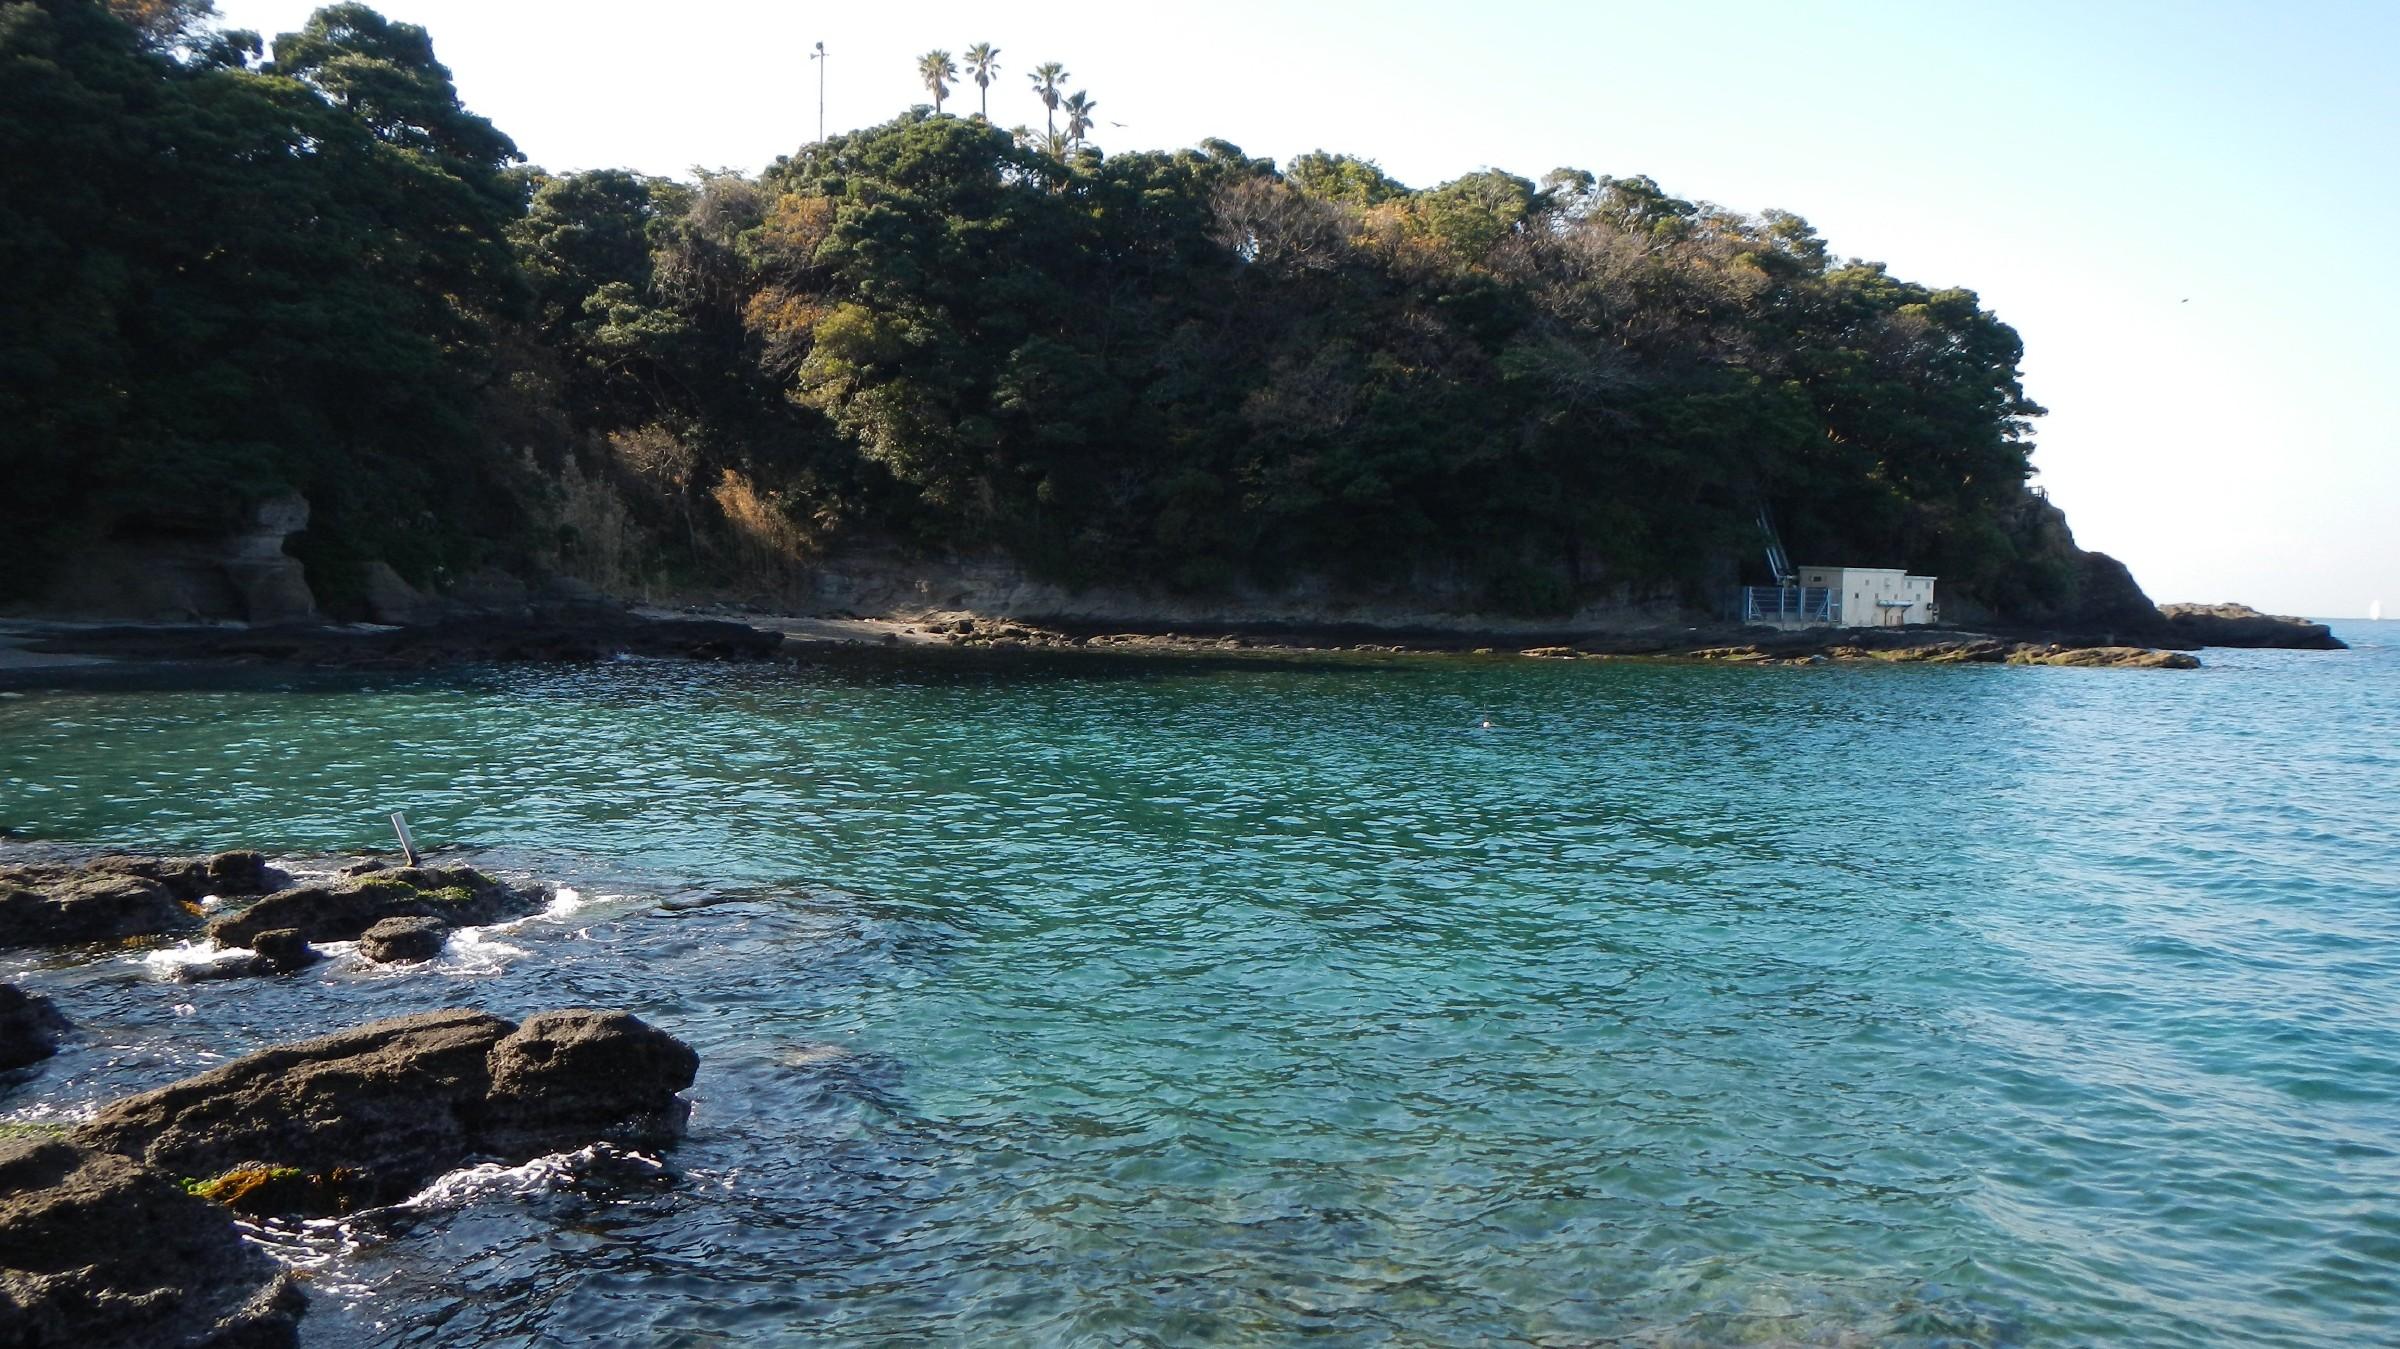 http://www.azami.sakura.ne.jp/miurahantou/2013/douami-20131207-04.jpg